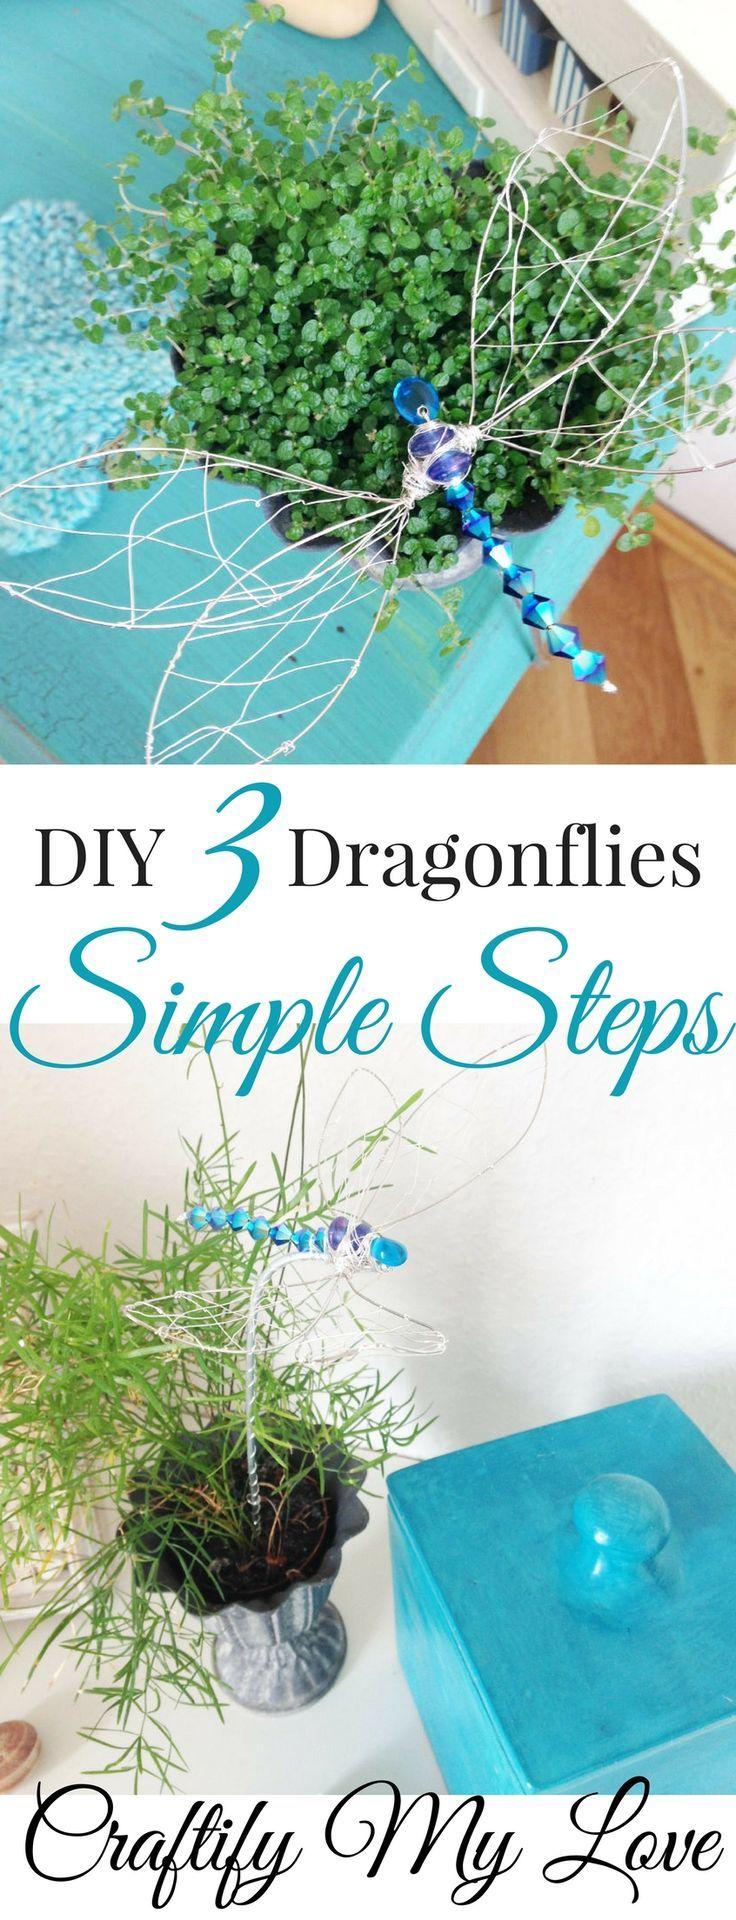 DIY Dragonflies: 3 Easy Steps